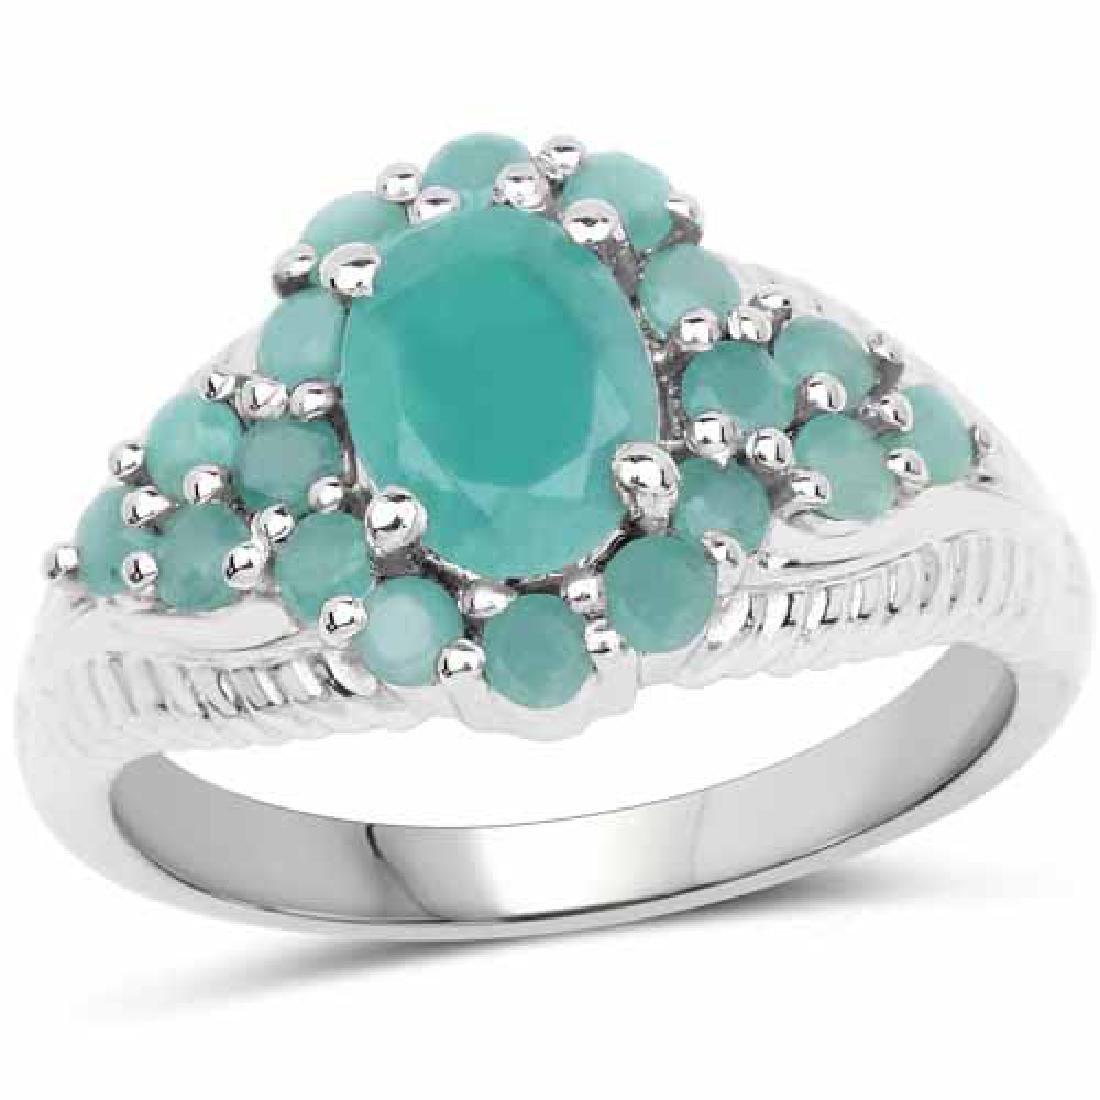 2.13 Carat Genuine Emerald .925 Sterling Silver Ring